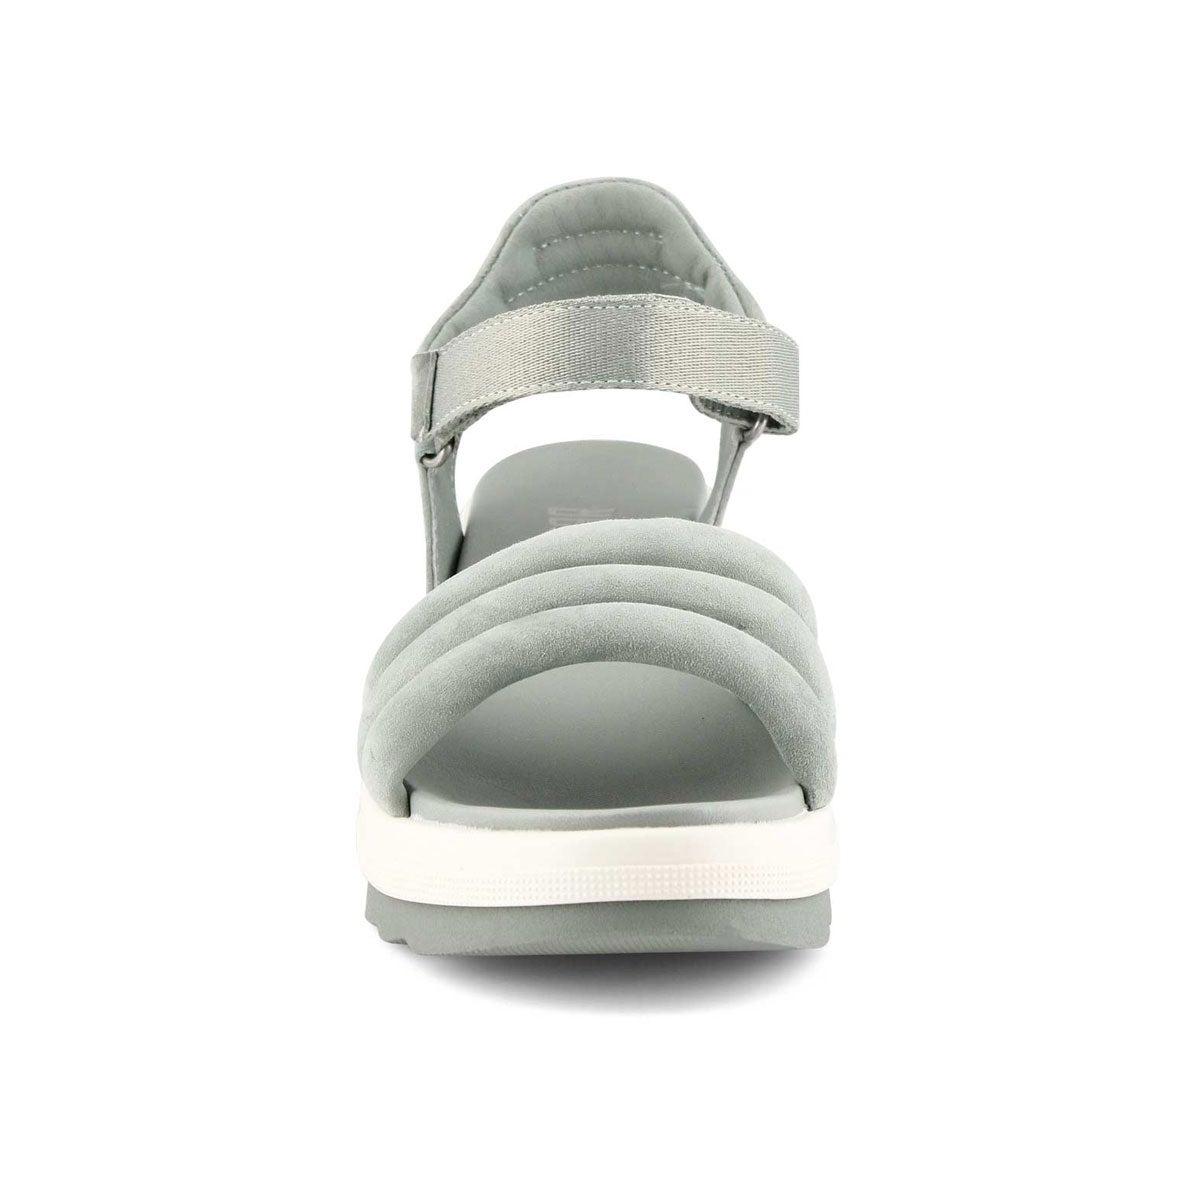 Women's HONEY sage wedge sandals